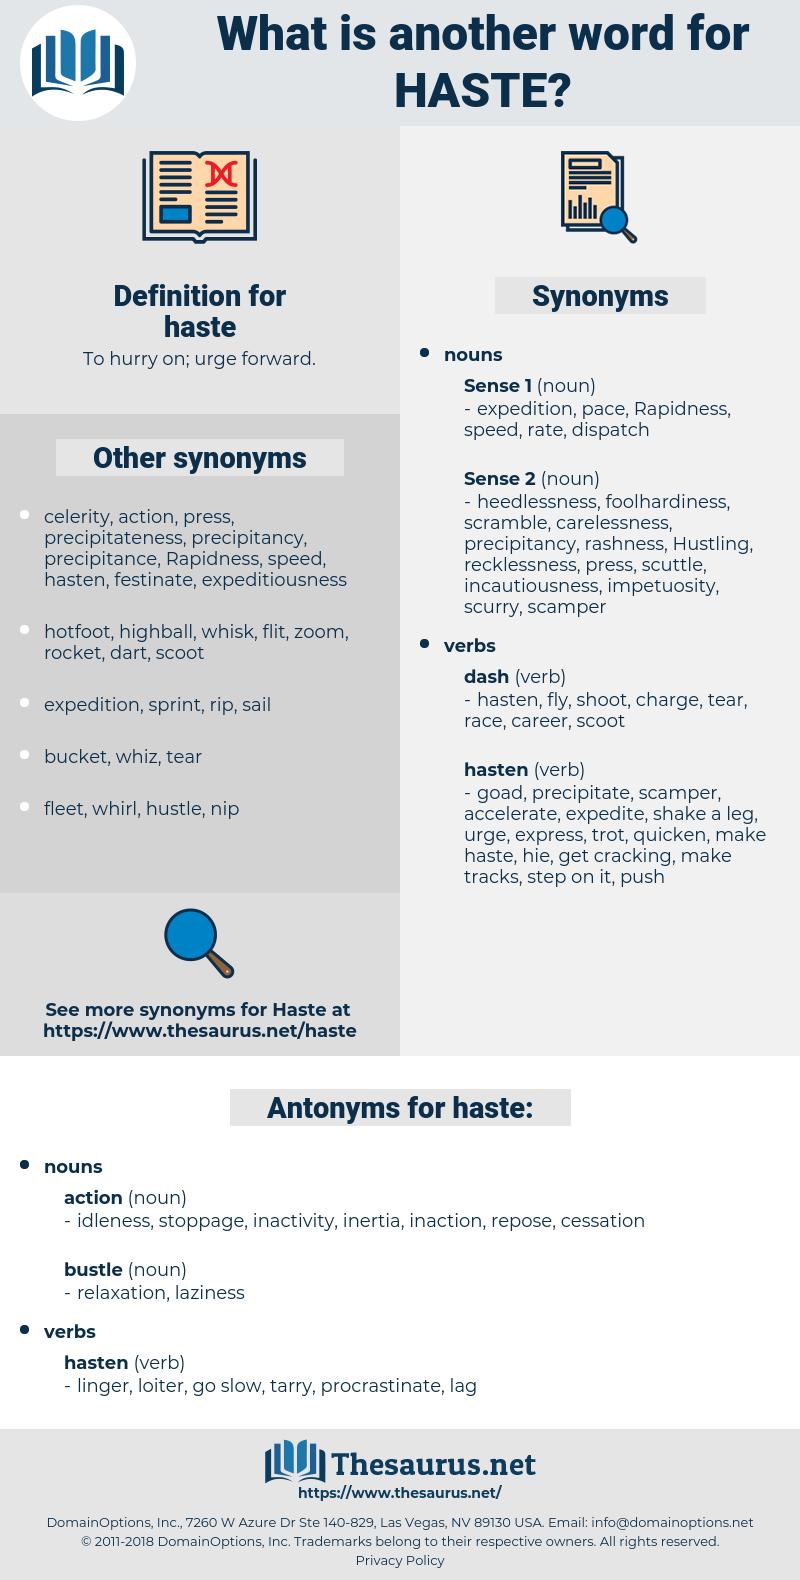 haste, synonym haste, another word for haste, words like haste, thesaurus haste